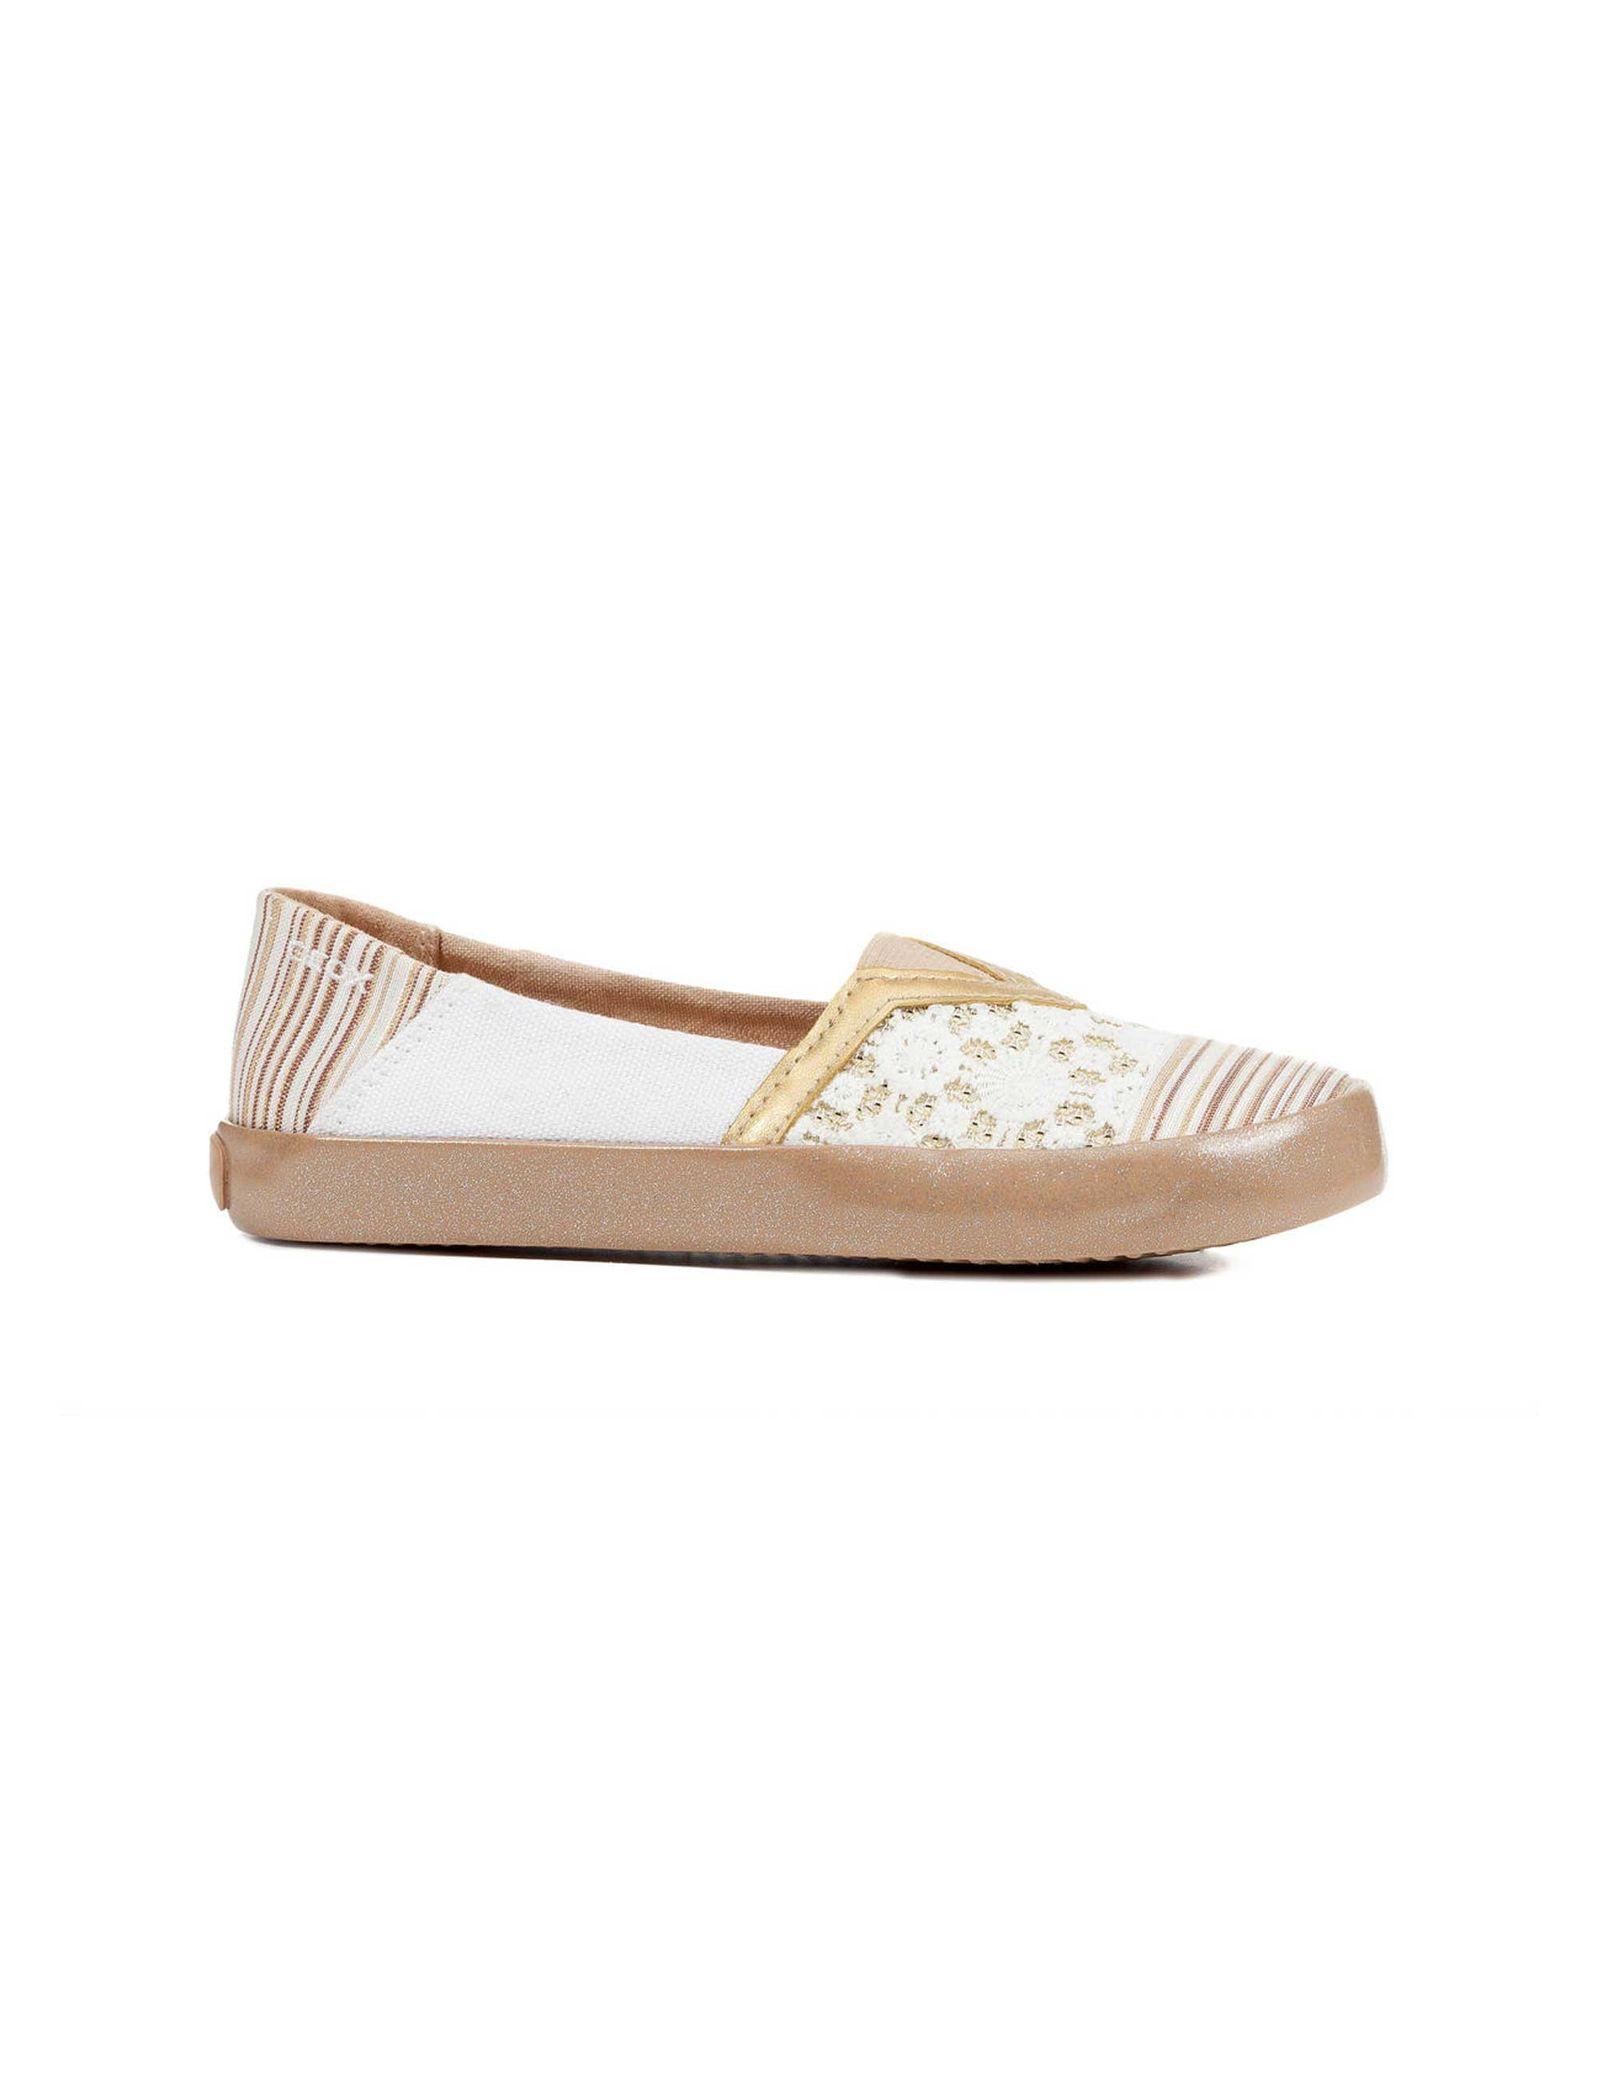 کفش تخت دخترانه JR KILWI - جی اوکس - طلايي - 1